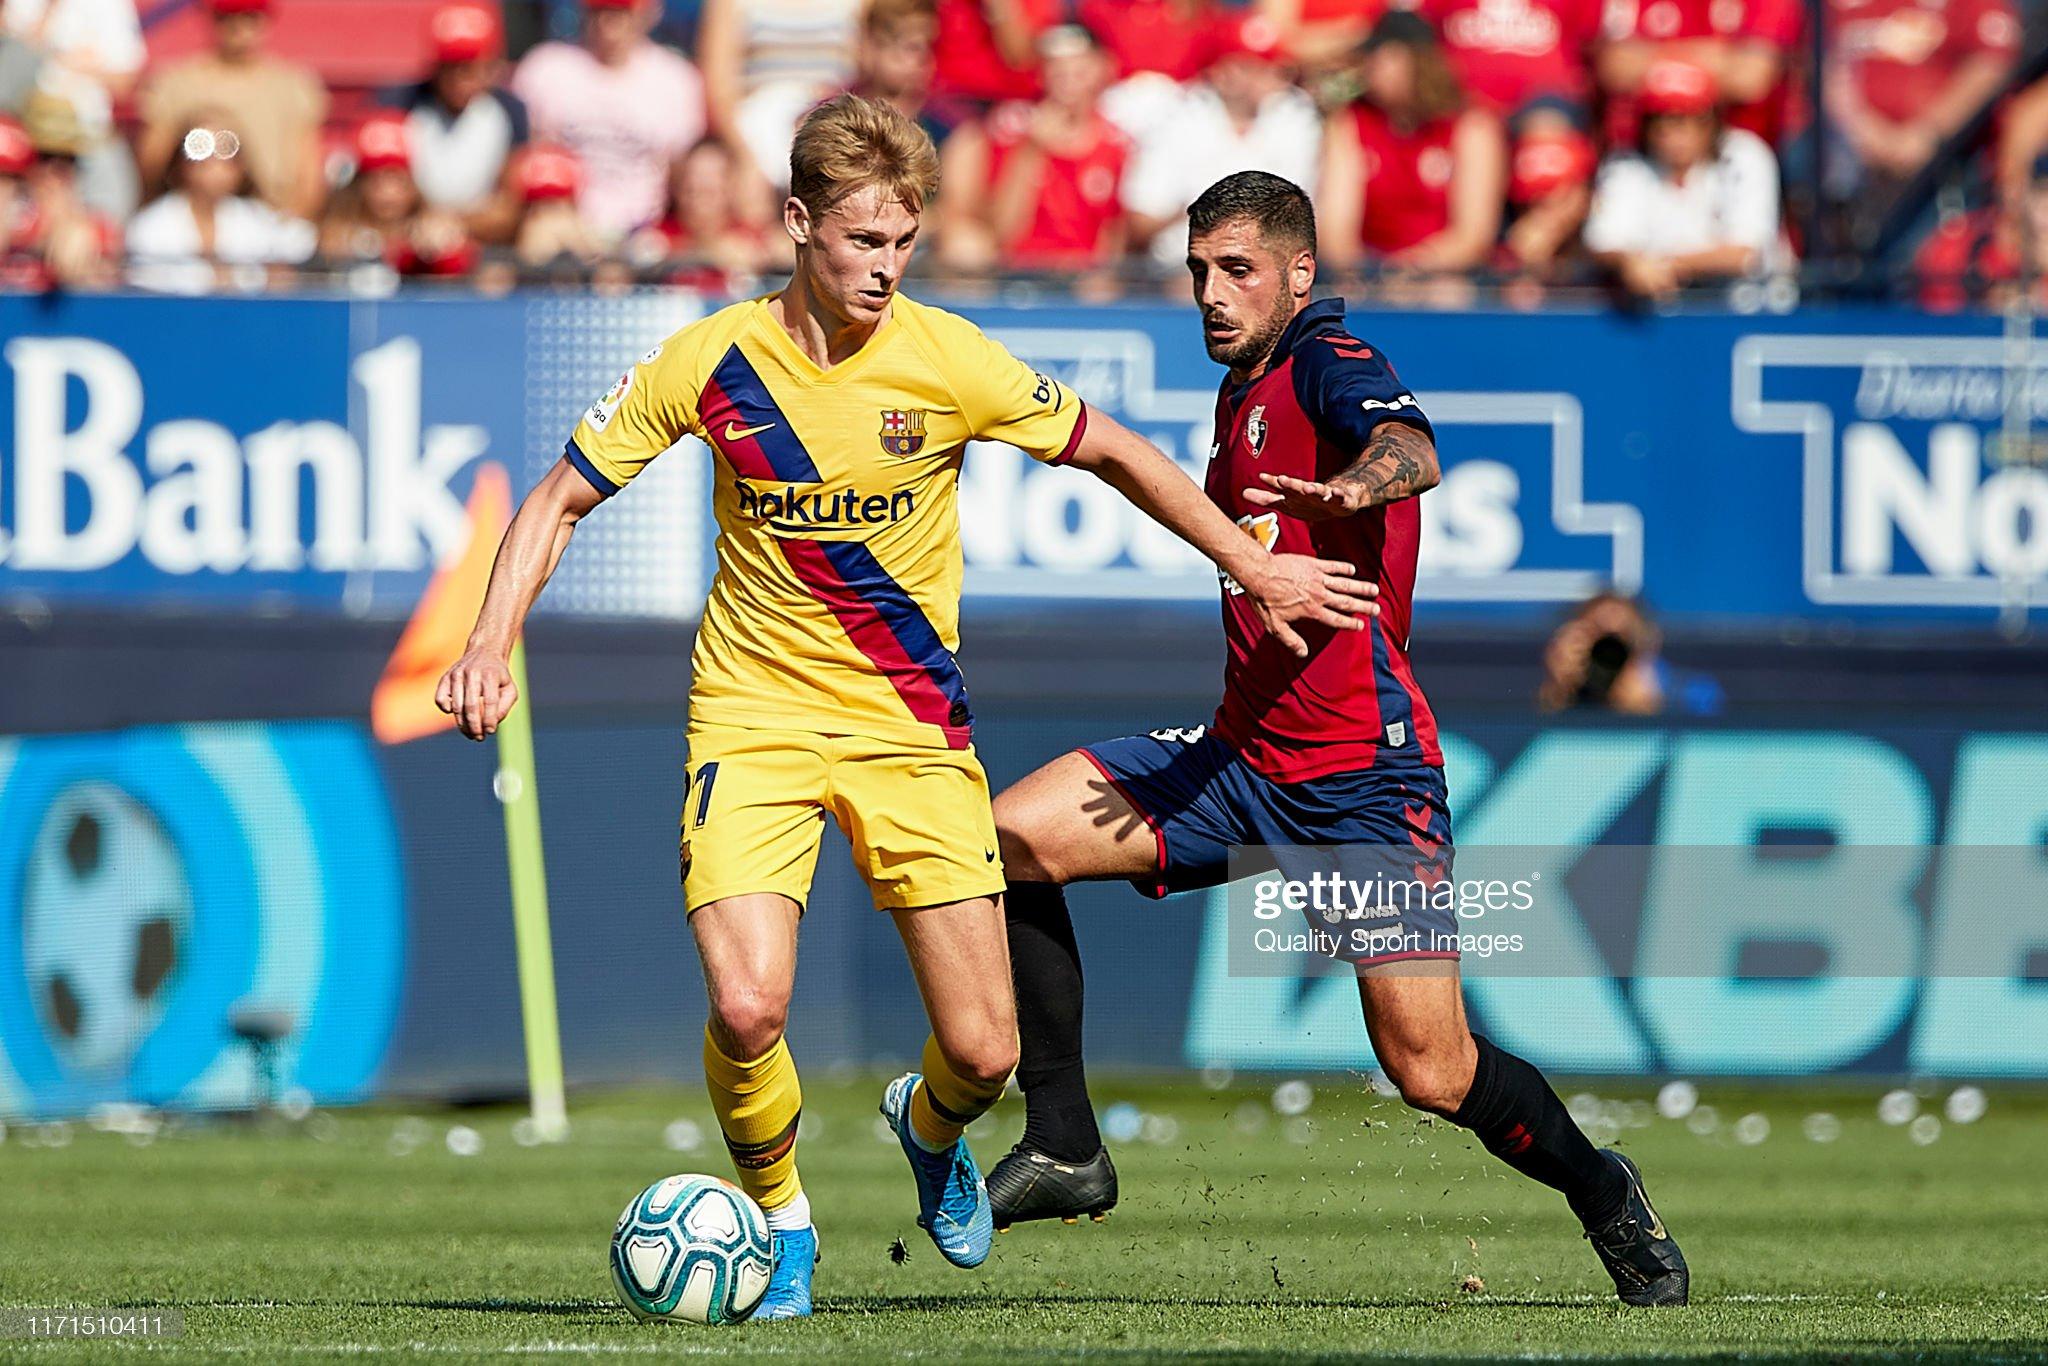 صور مباراة : أوساسونا - برشلونة 2-2 ( 31-08-2019 )  Fran-merida-of-ca-osasuna-competes-for-the-ball-with-antoine-of-fc-picture-id1171510411?s=2048x2048